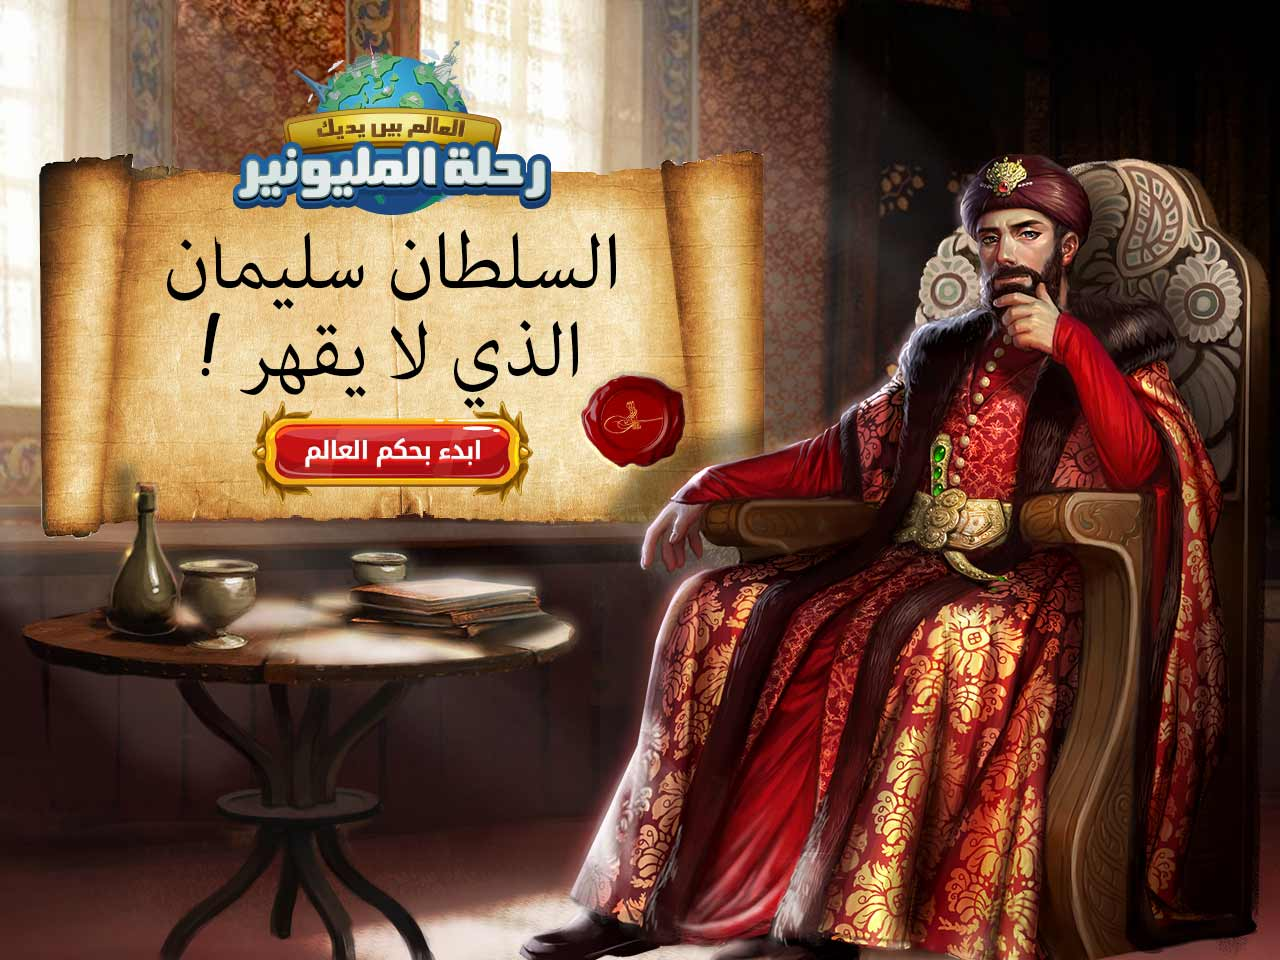 travelling_millionare_suleiman_news_ar